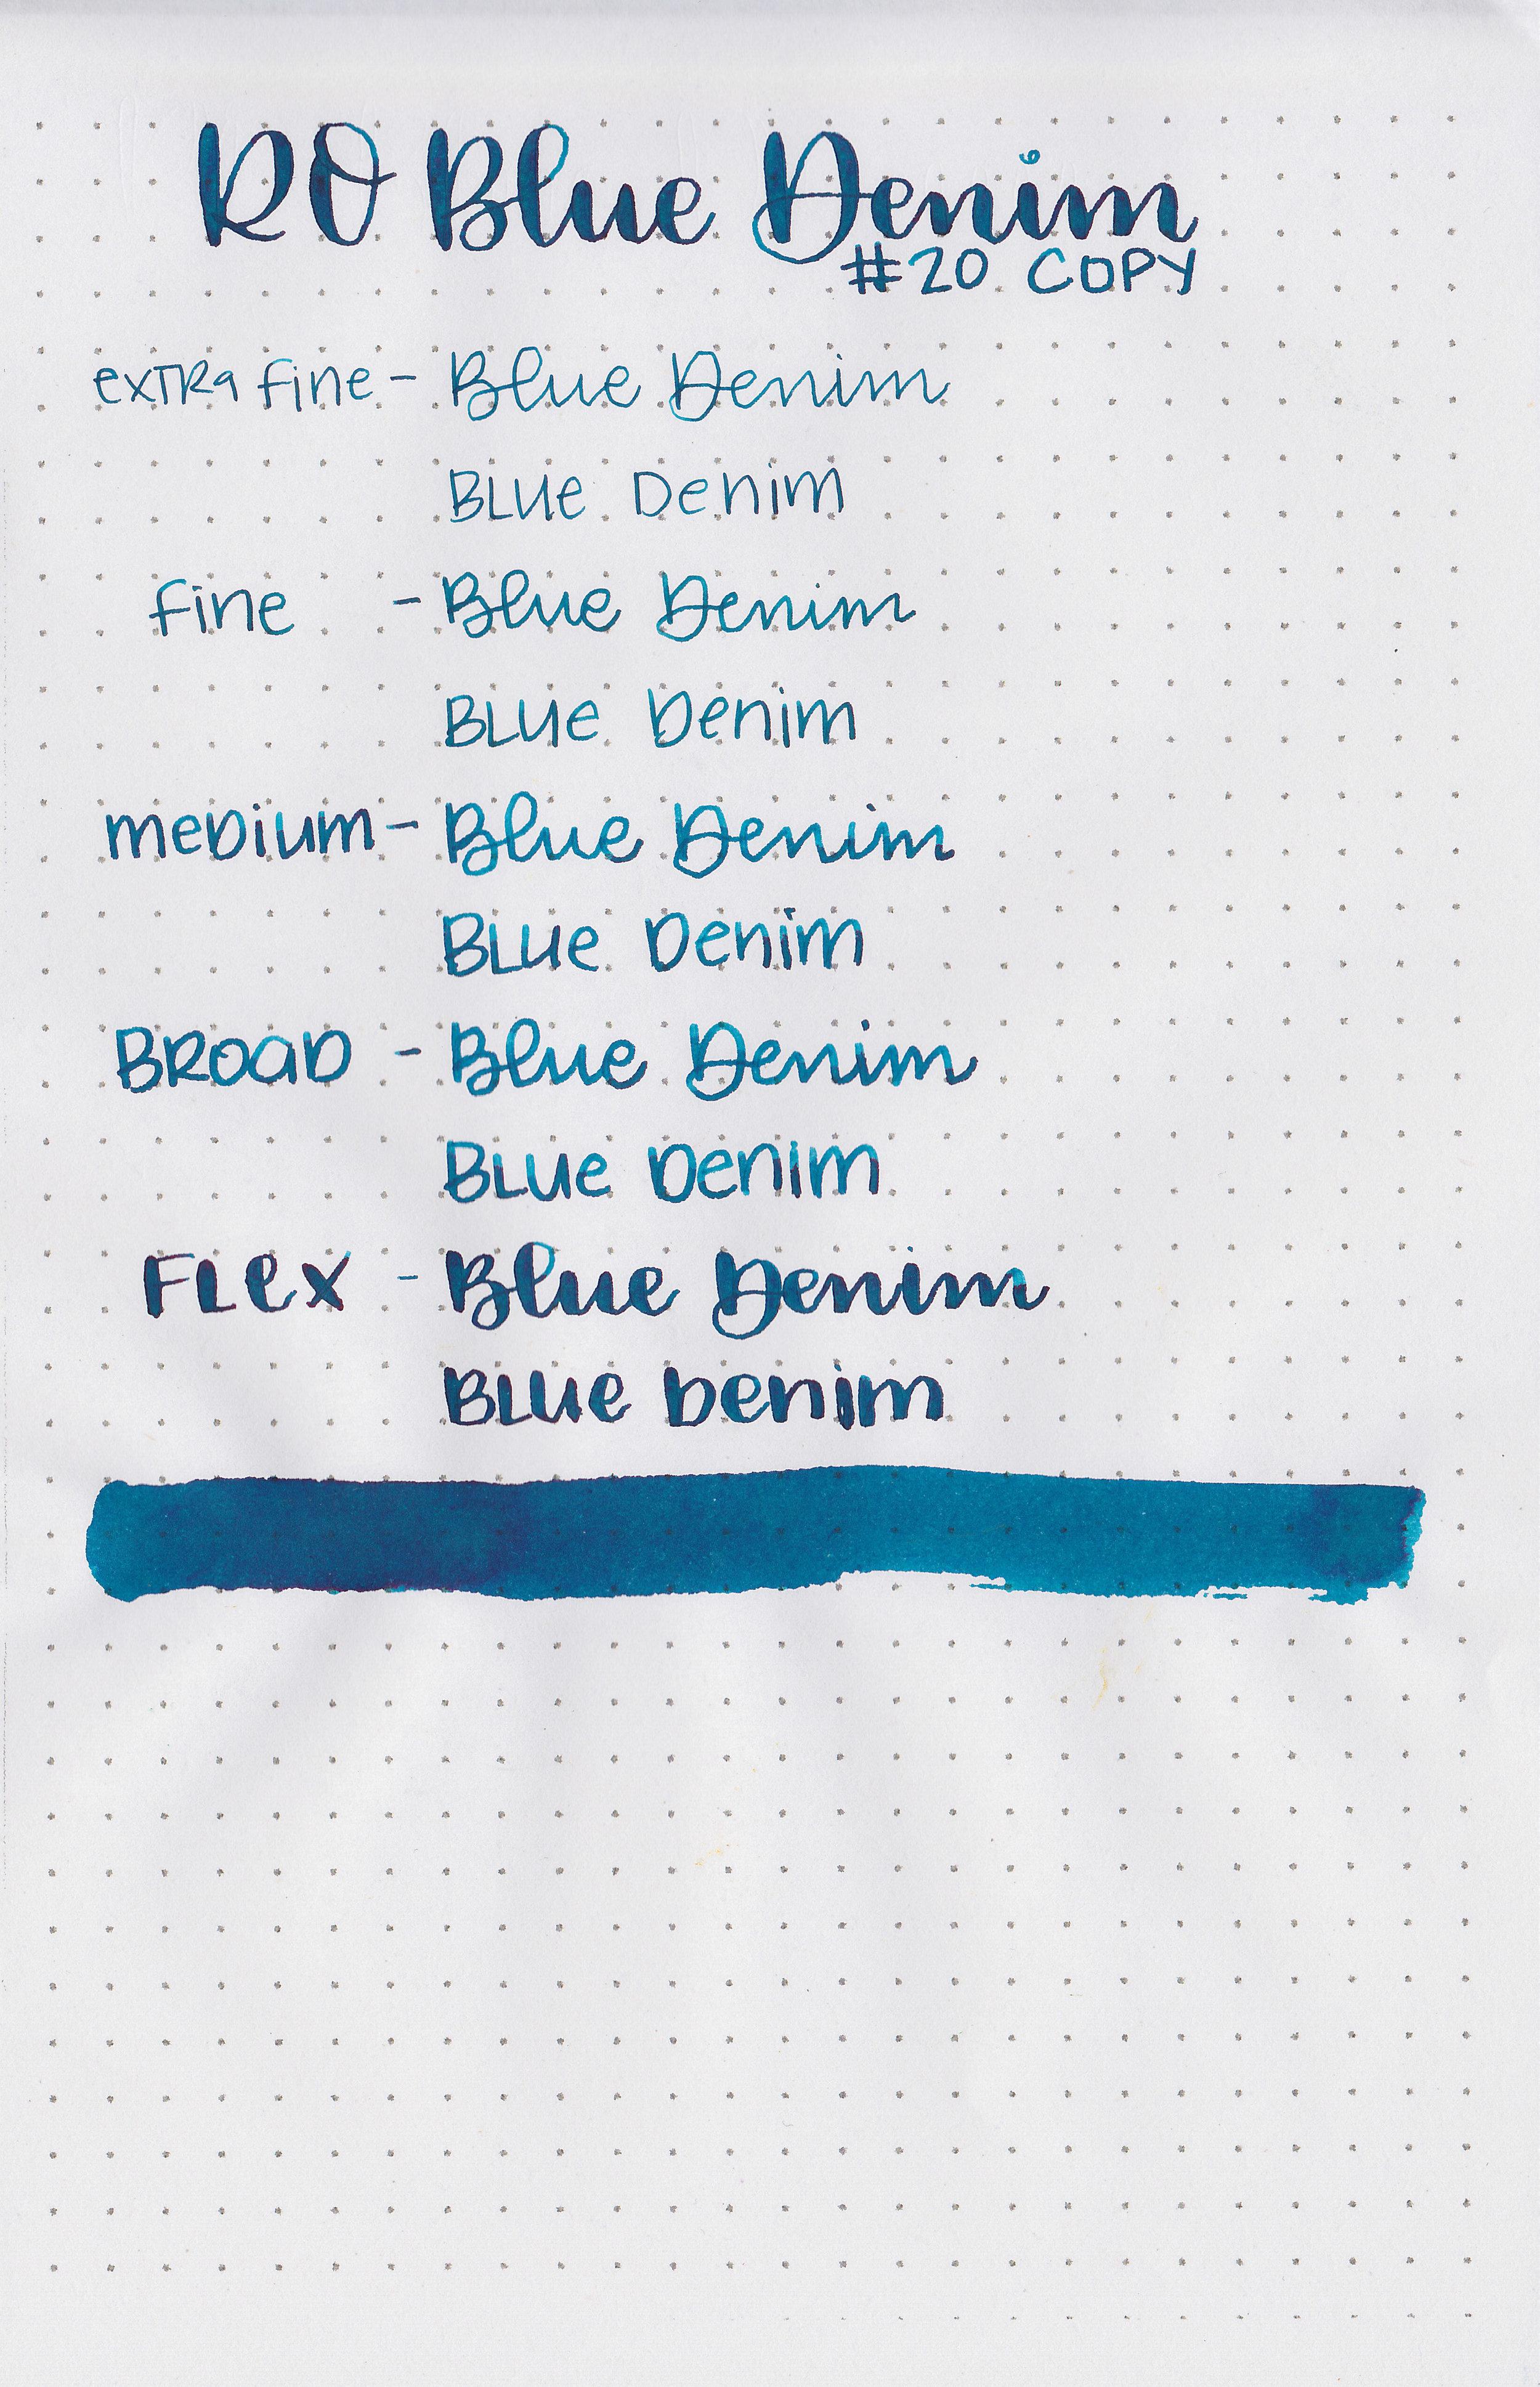 ro-blue-denim-13.jpg